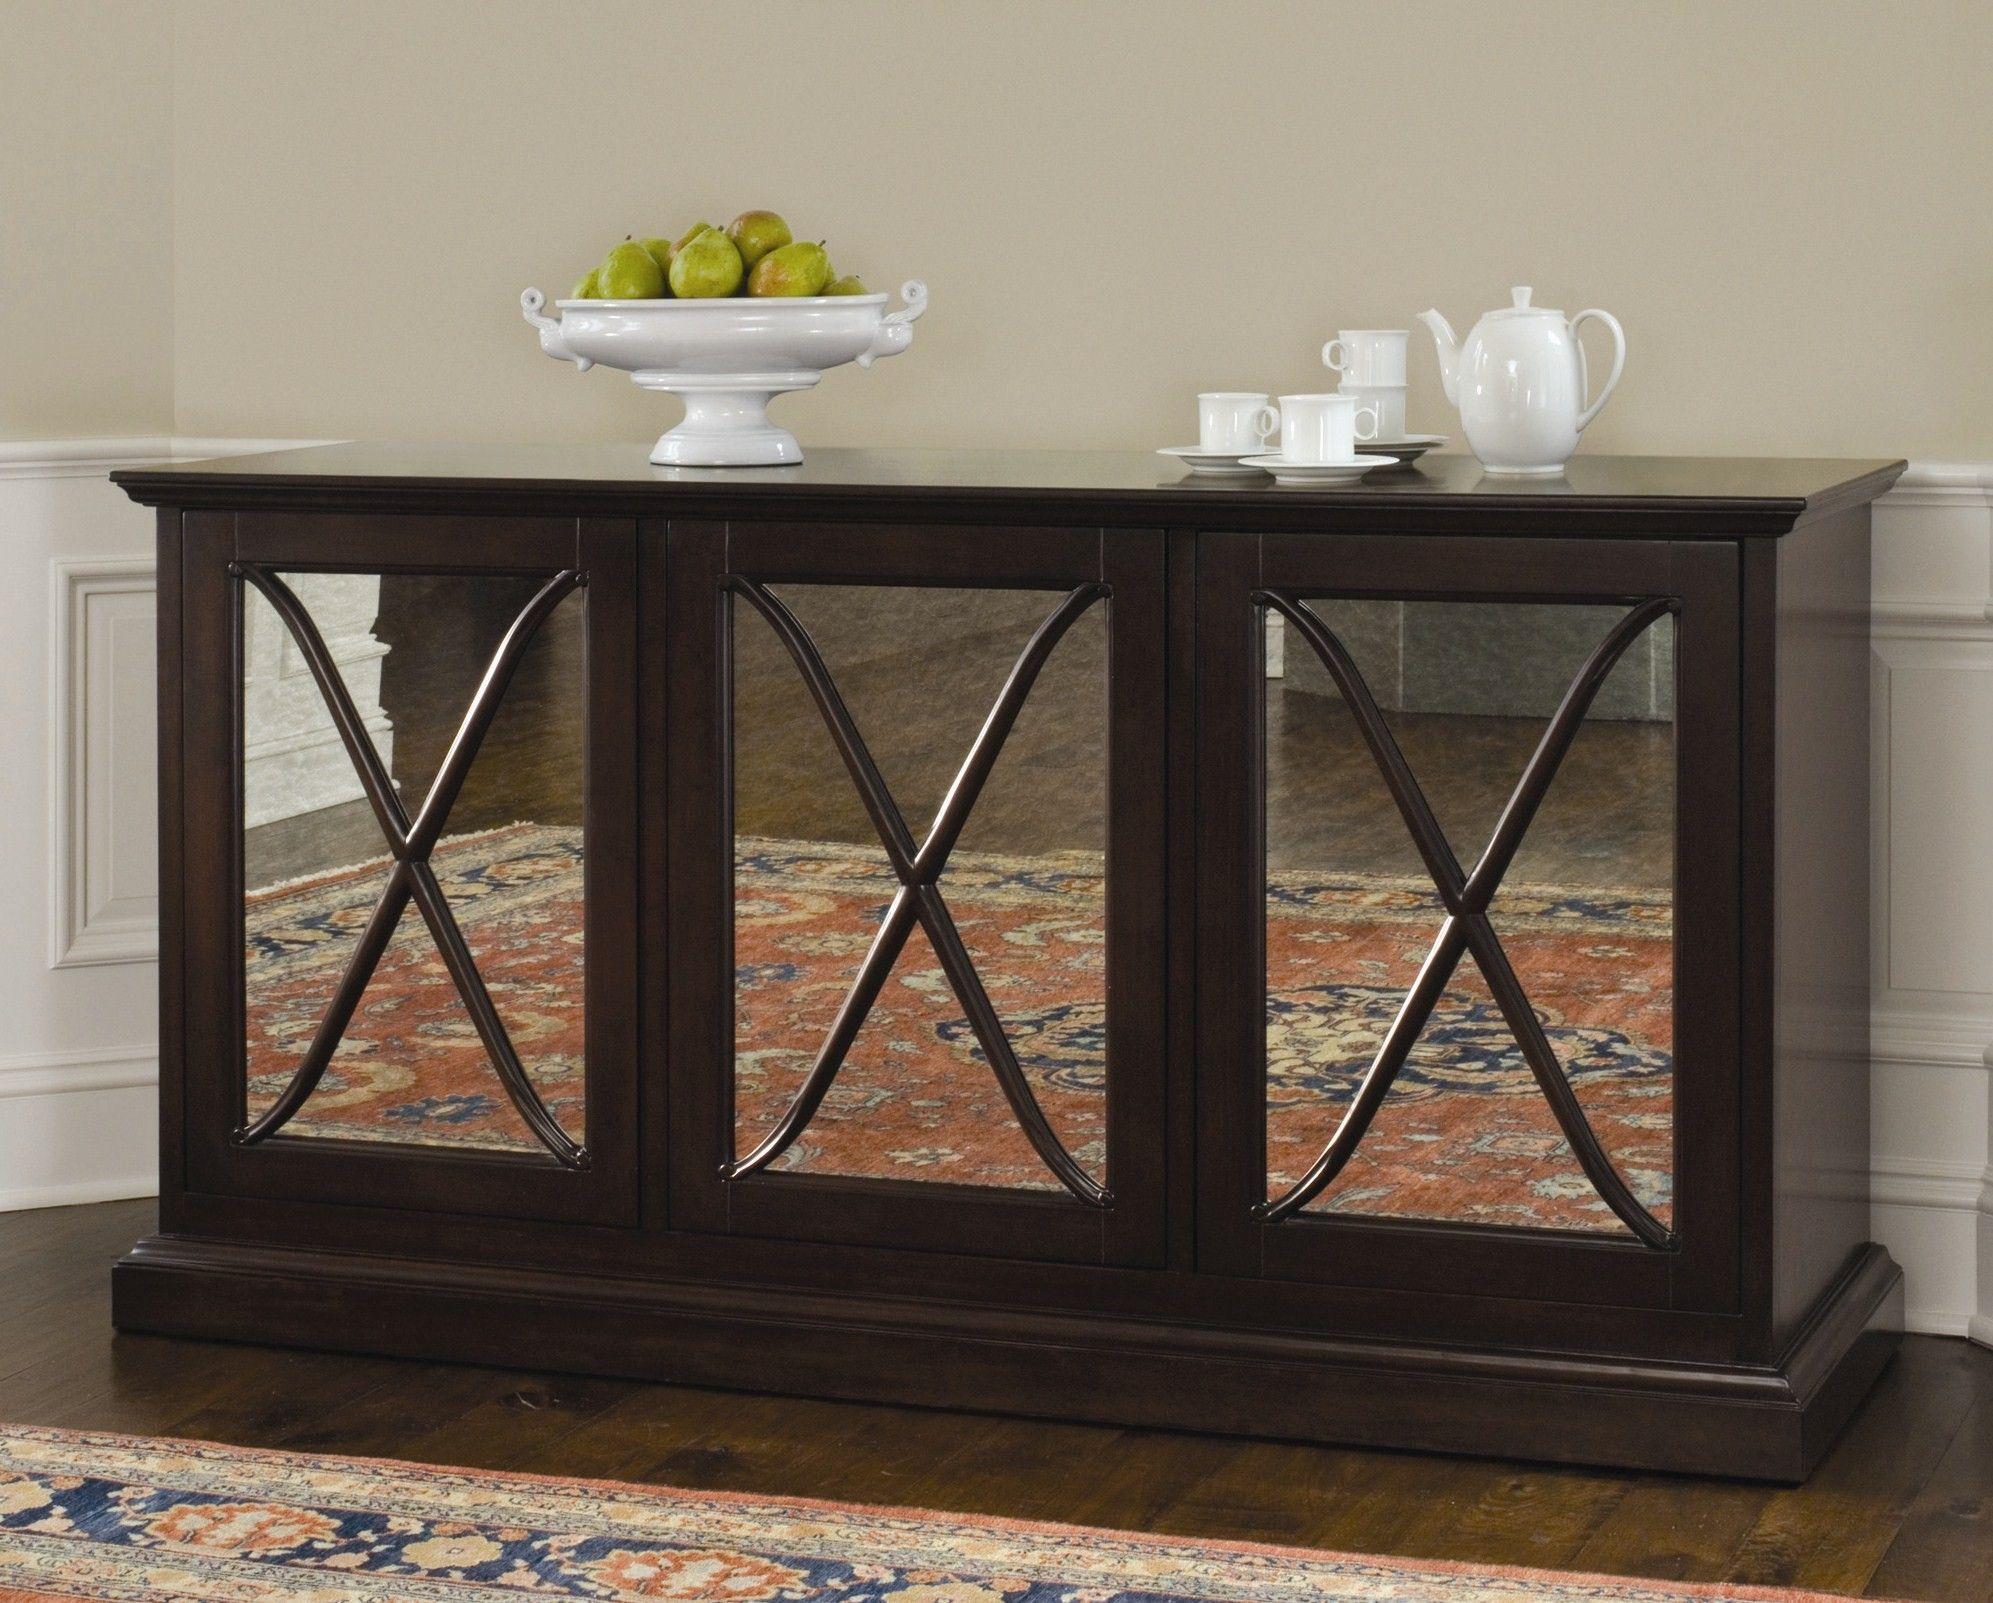 Dark Wood Mirrored Credenza : Luxury mirrored modern buffet table with triple door added dark